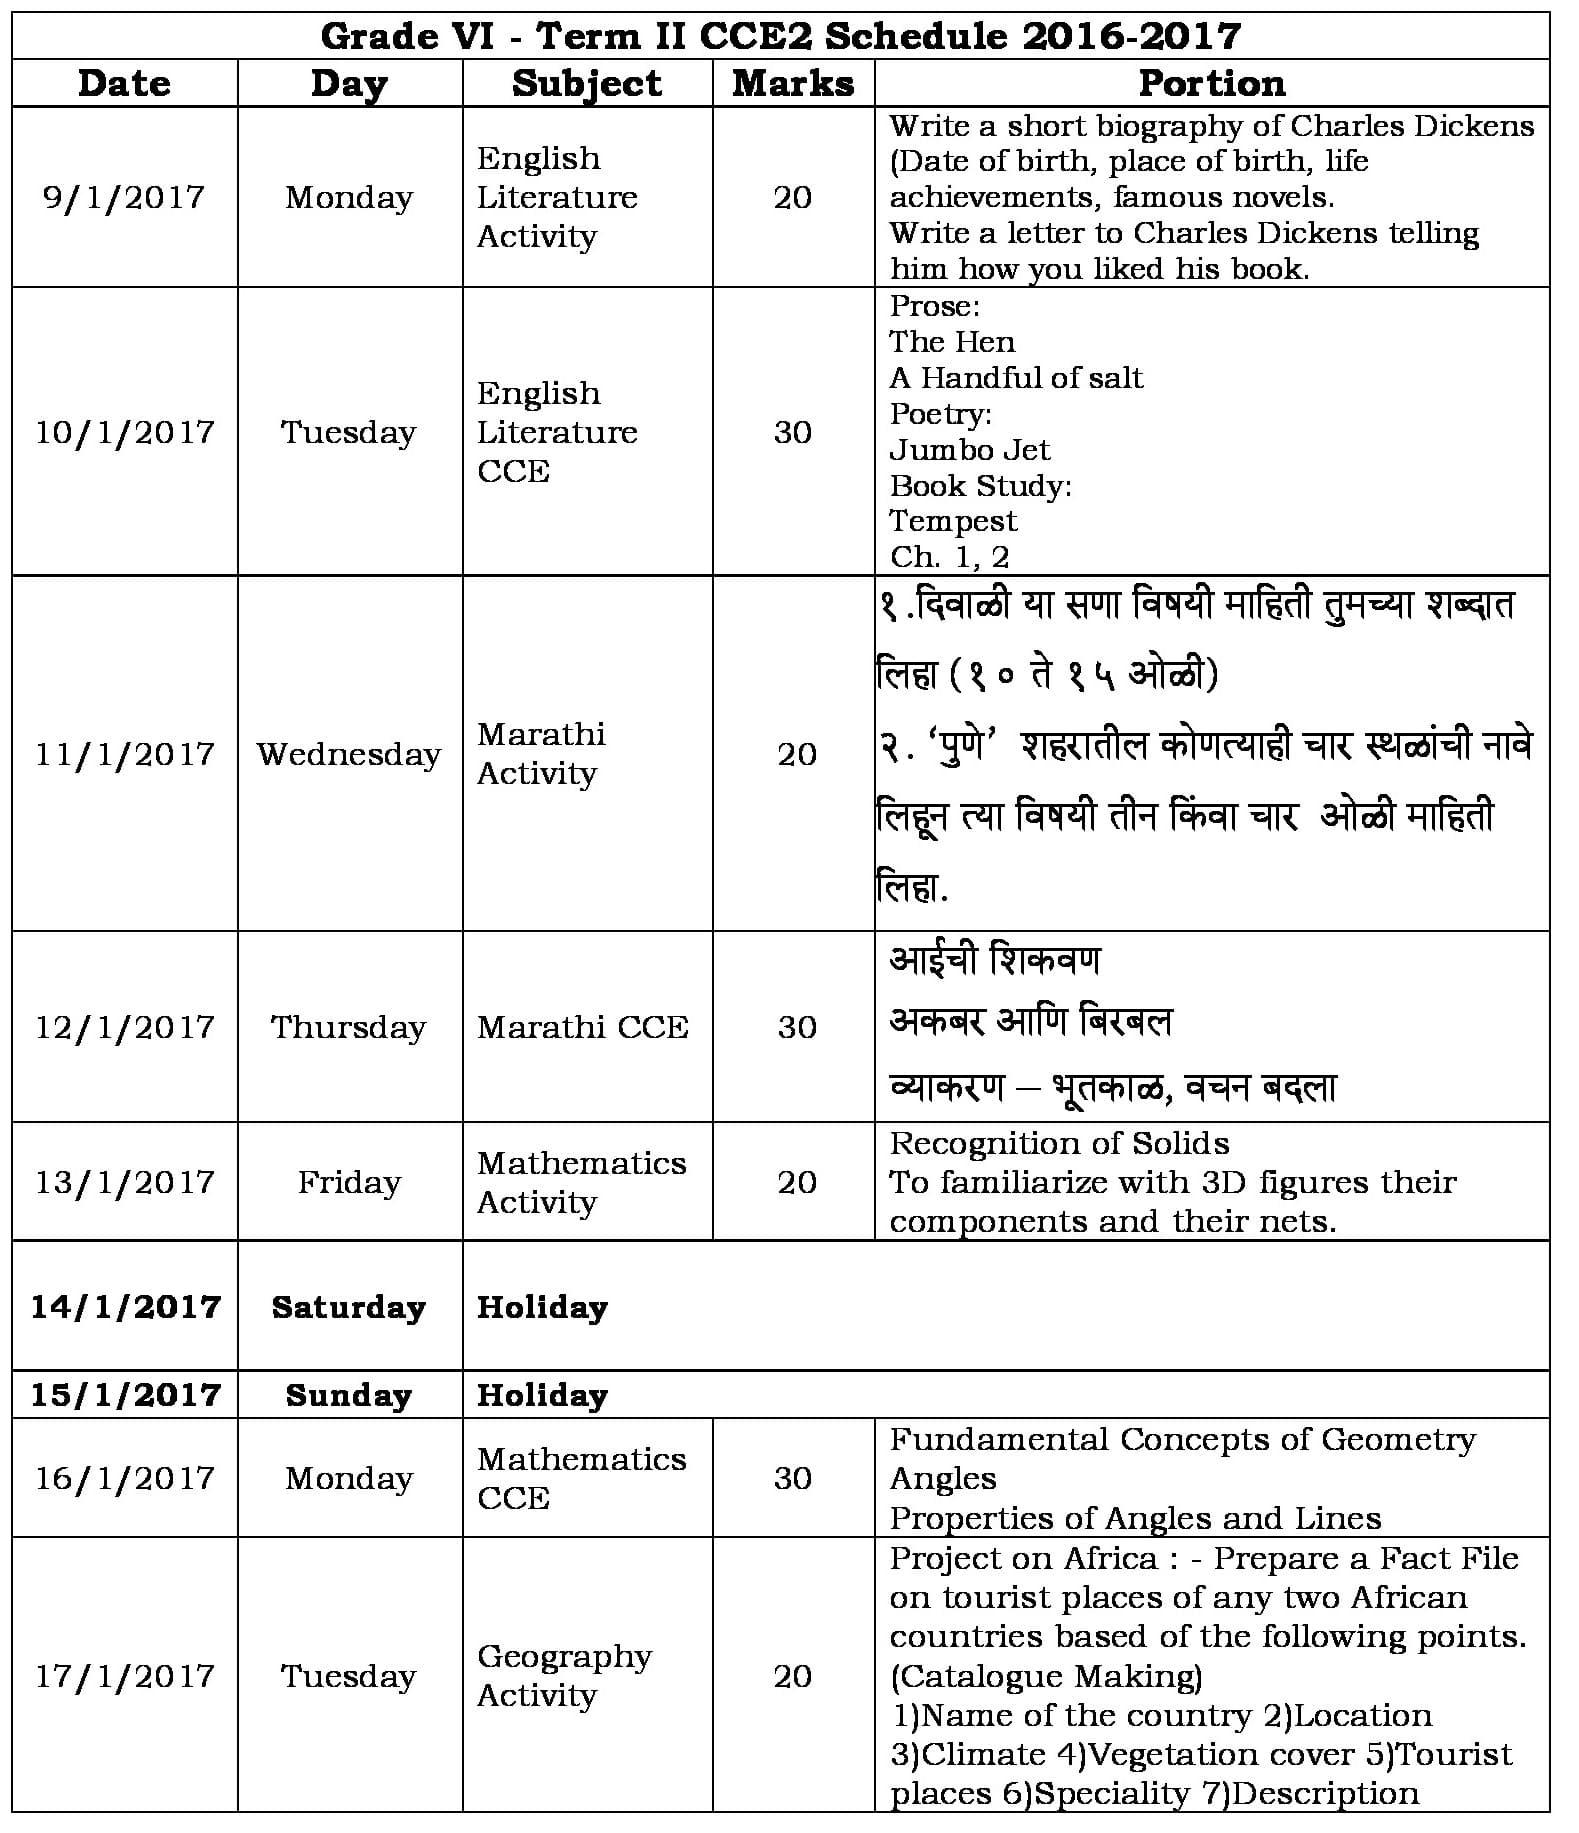 grade-vi-cce2-schedule-2016-17-0